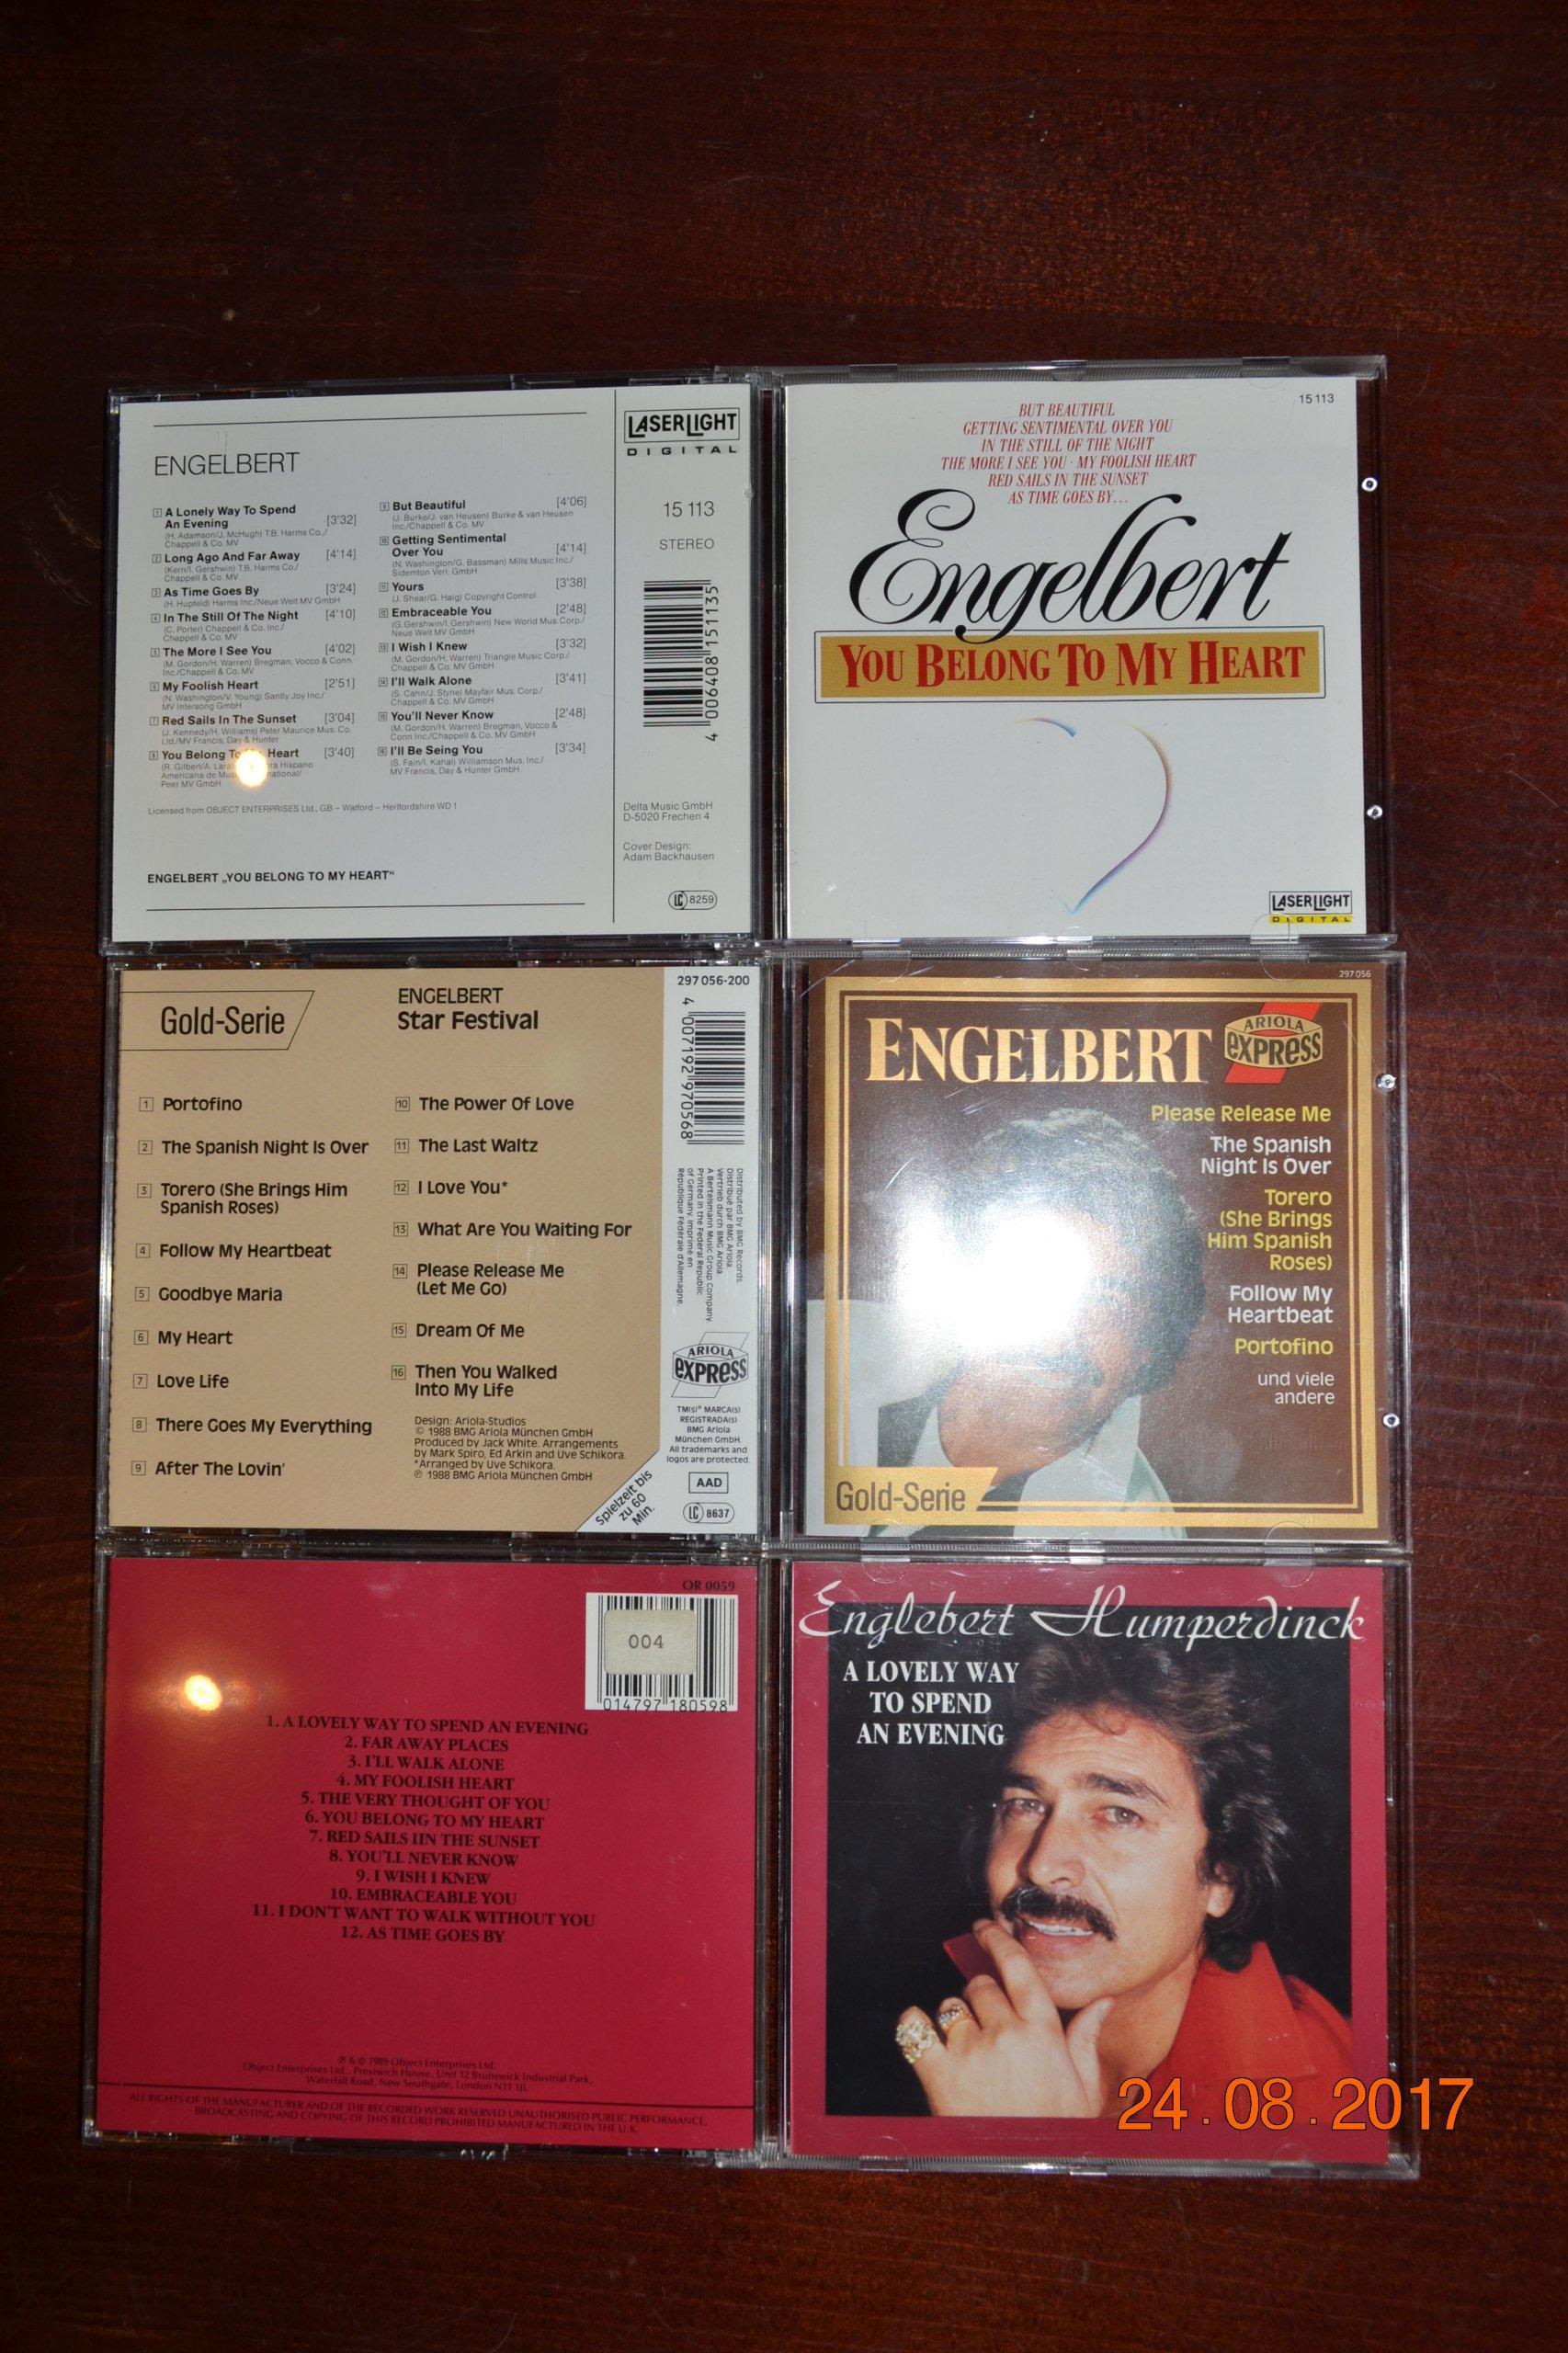 779779d7a688c ENGELBERG zestaw 3 płyt CD #5 - 7497472305 - oficjalne archiwum allegro